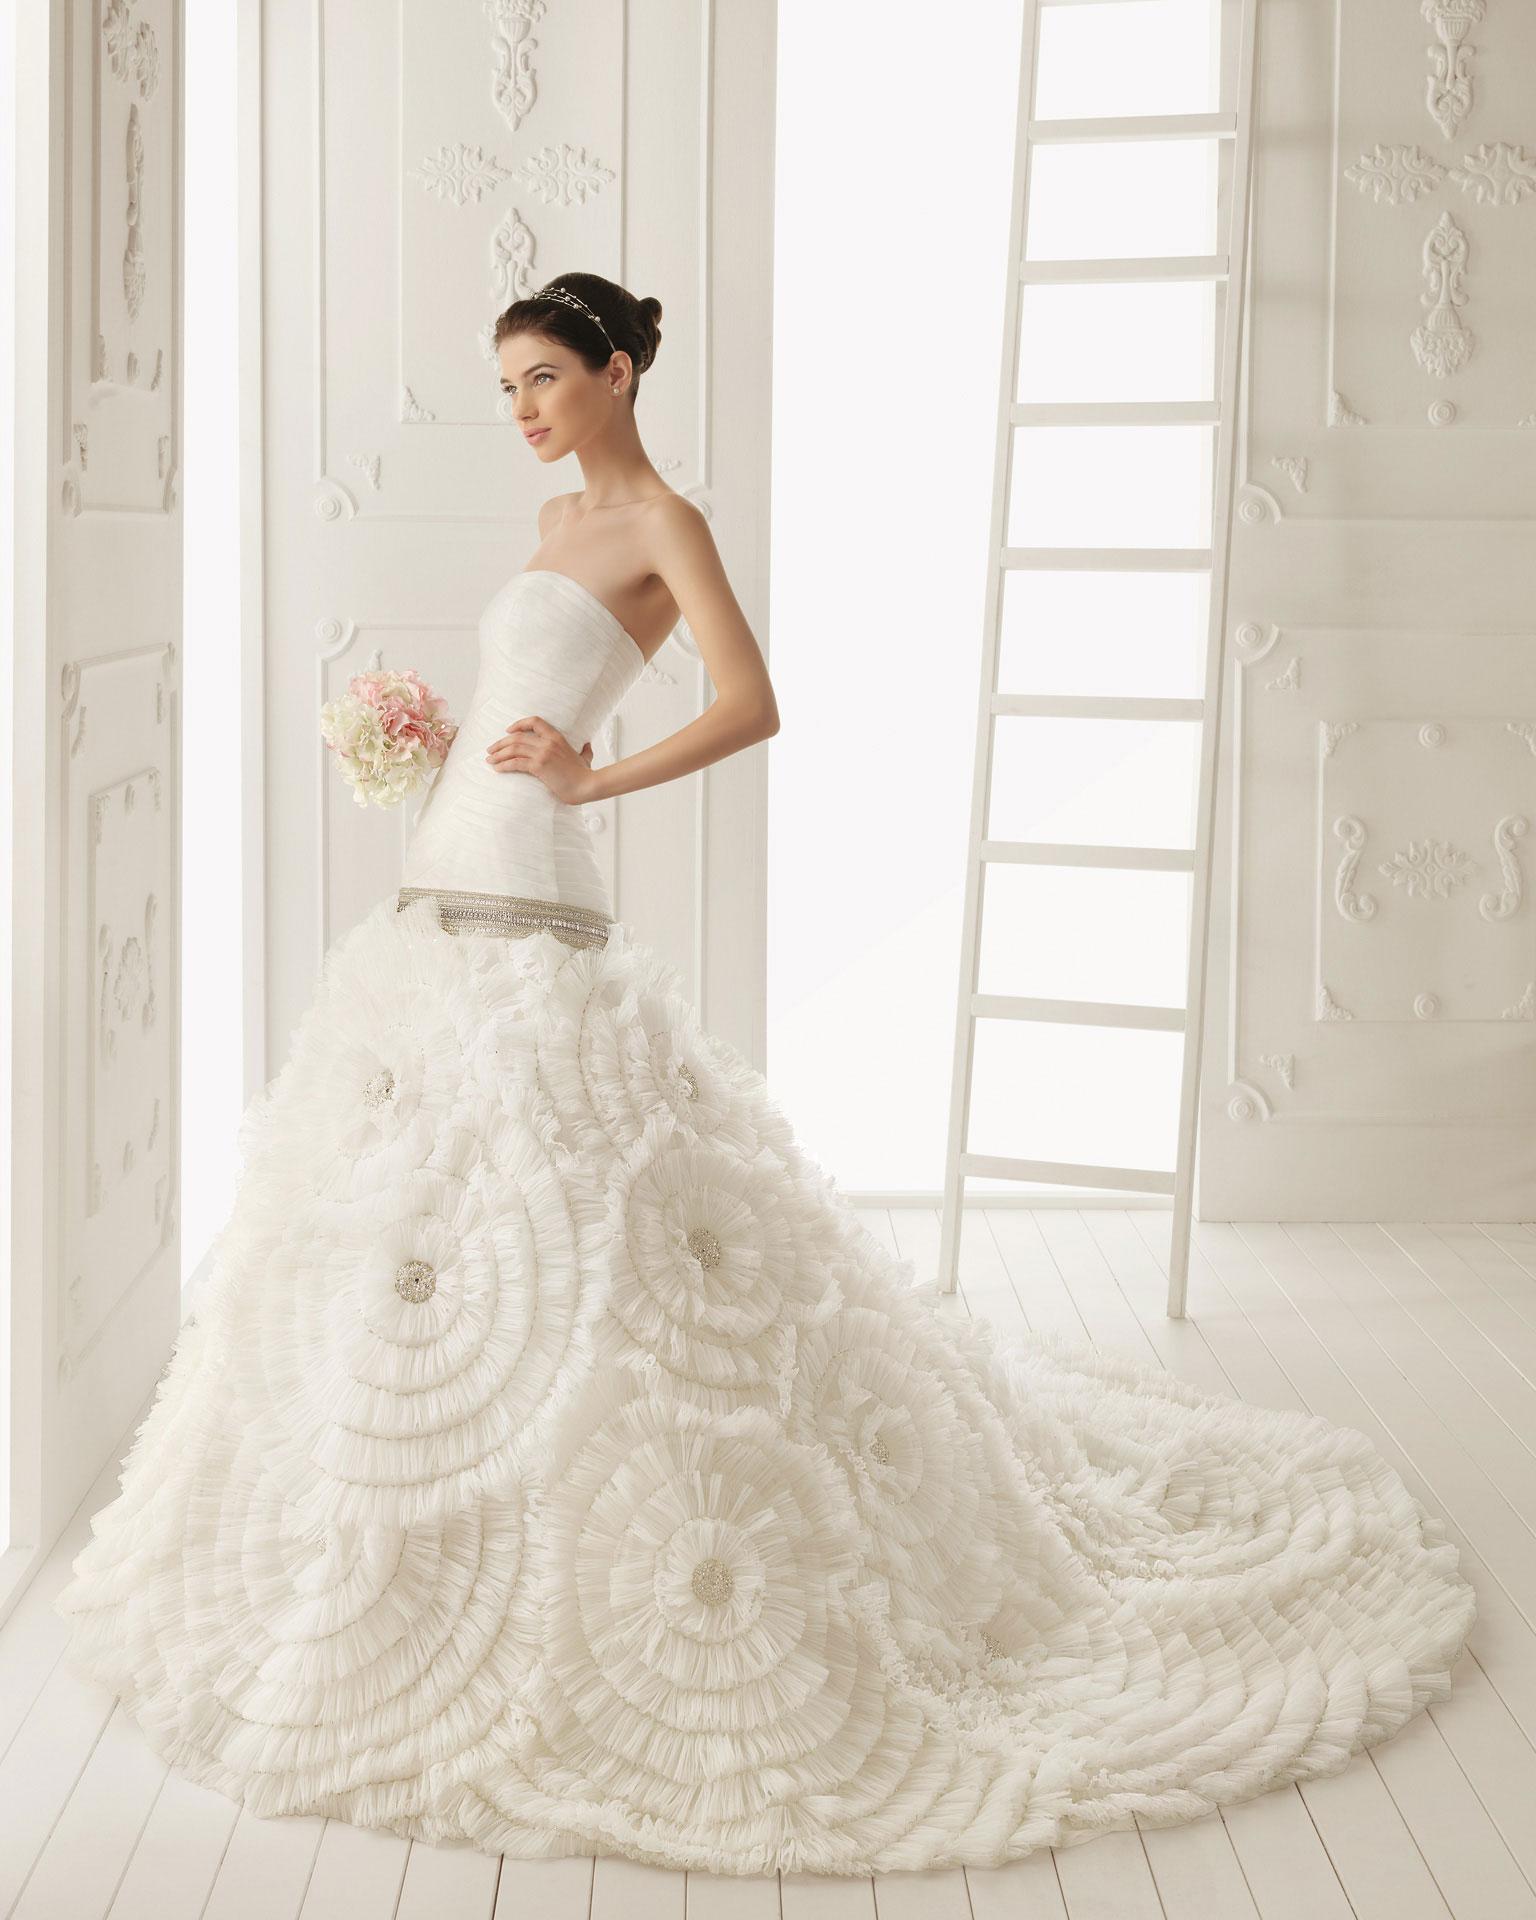 2 different wedding dresses fantastic wedding dress